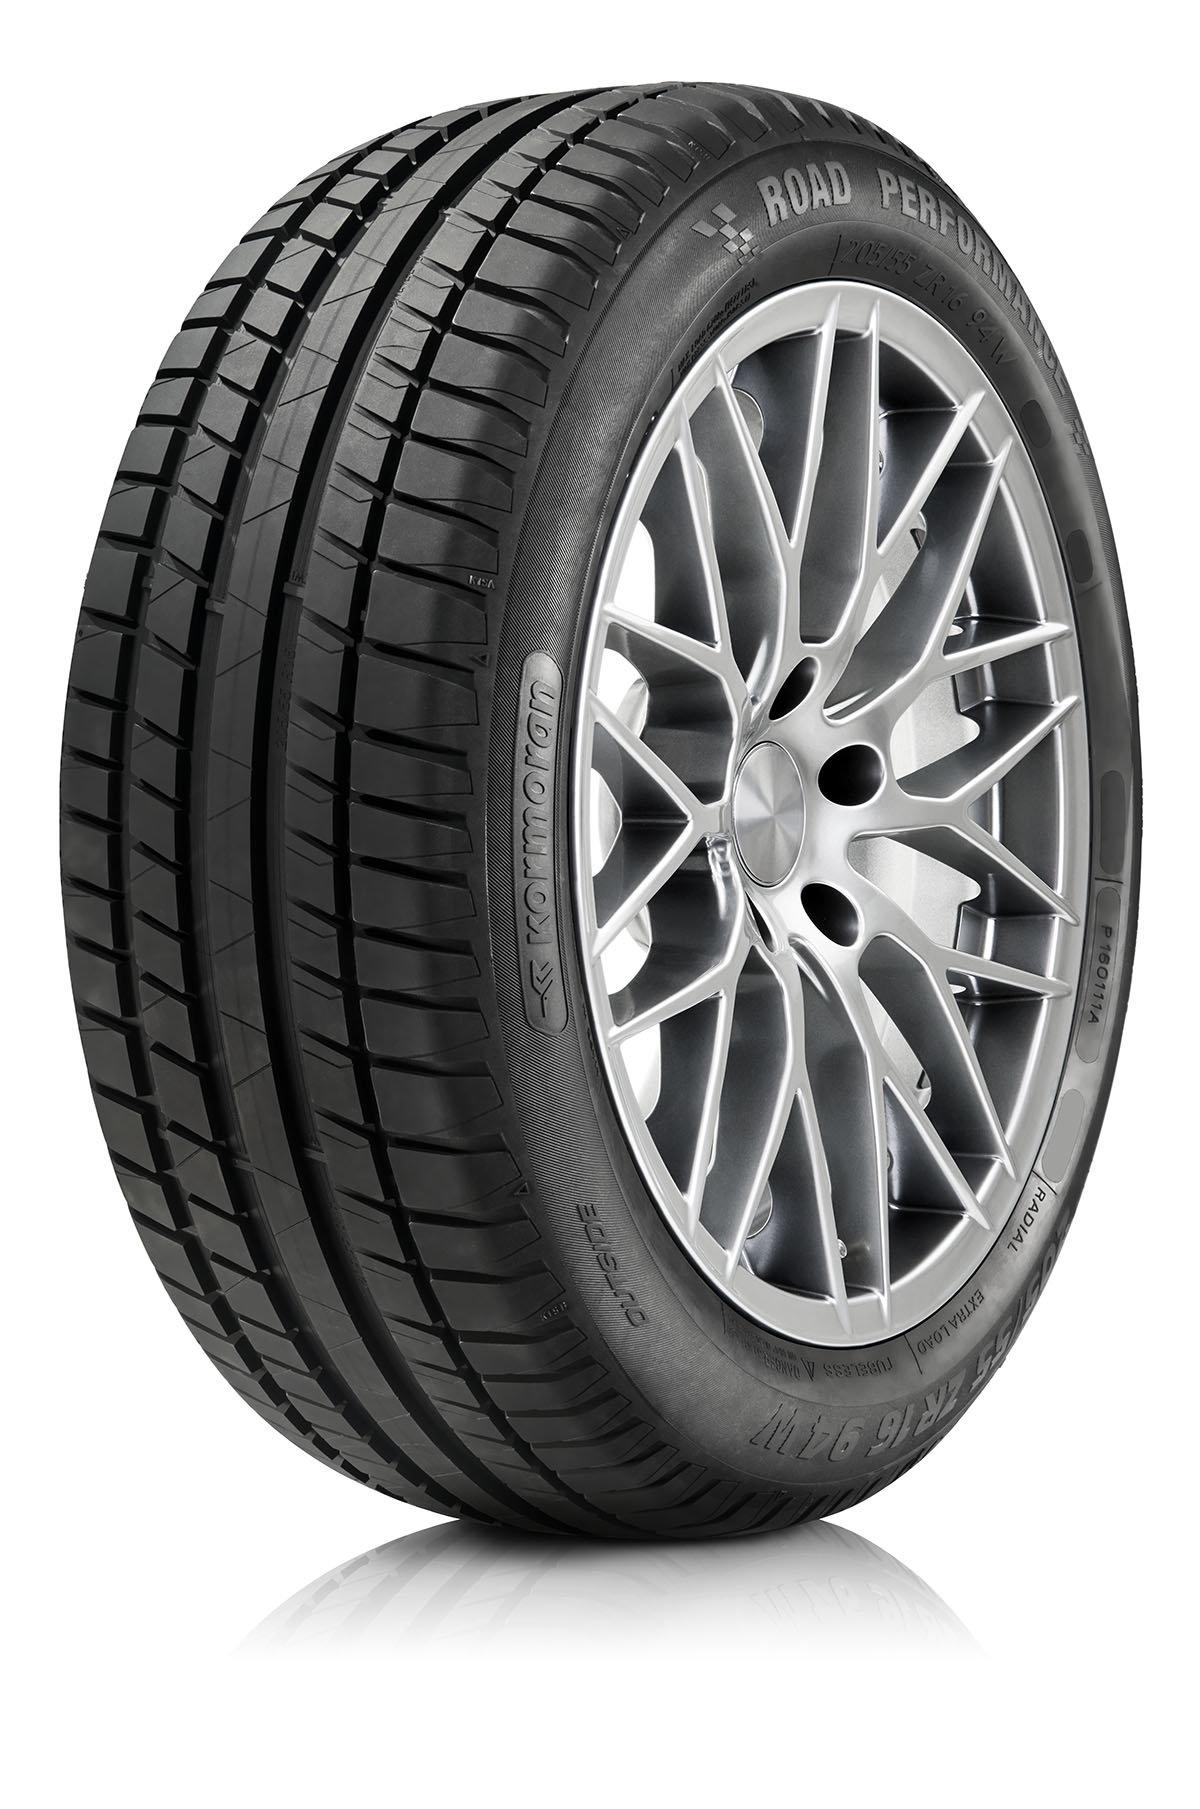 kormoran-road-performance-225-55r1699w